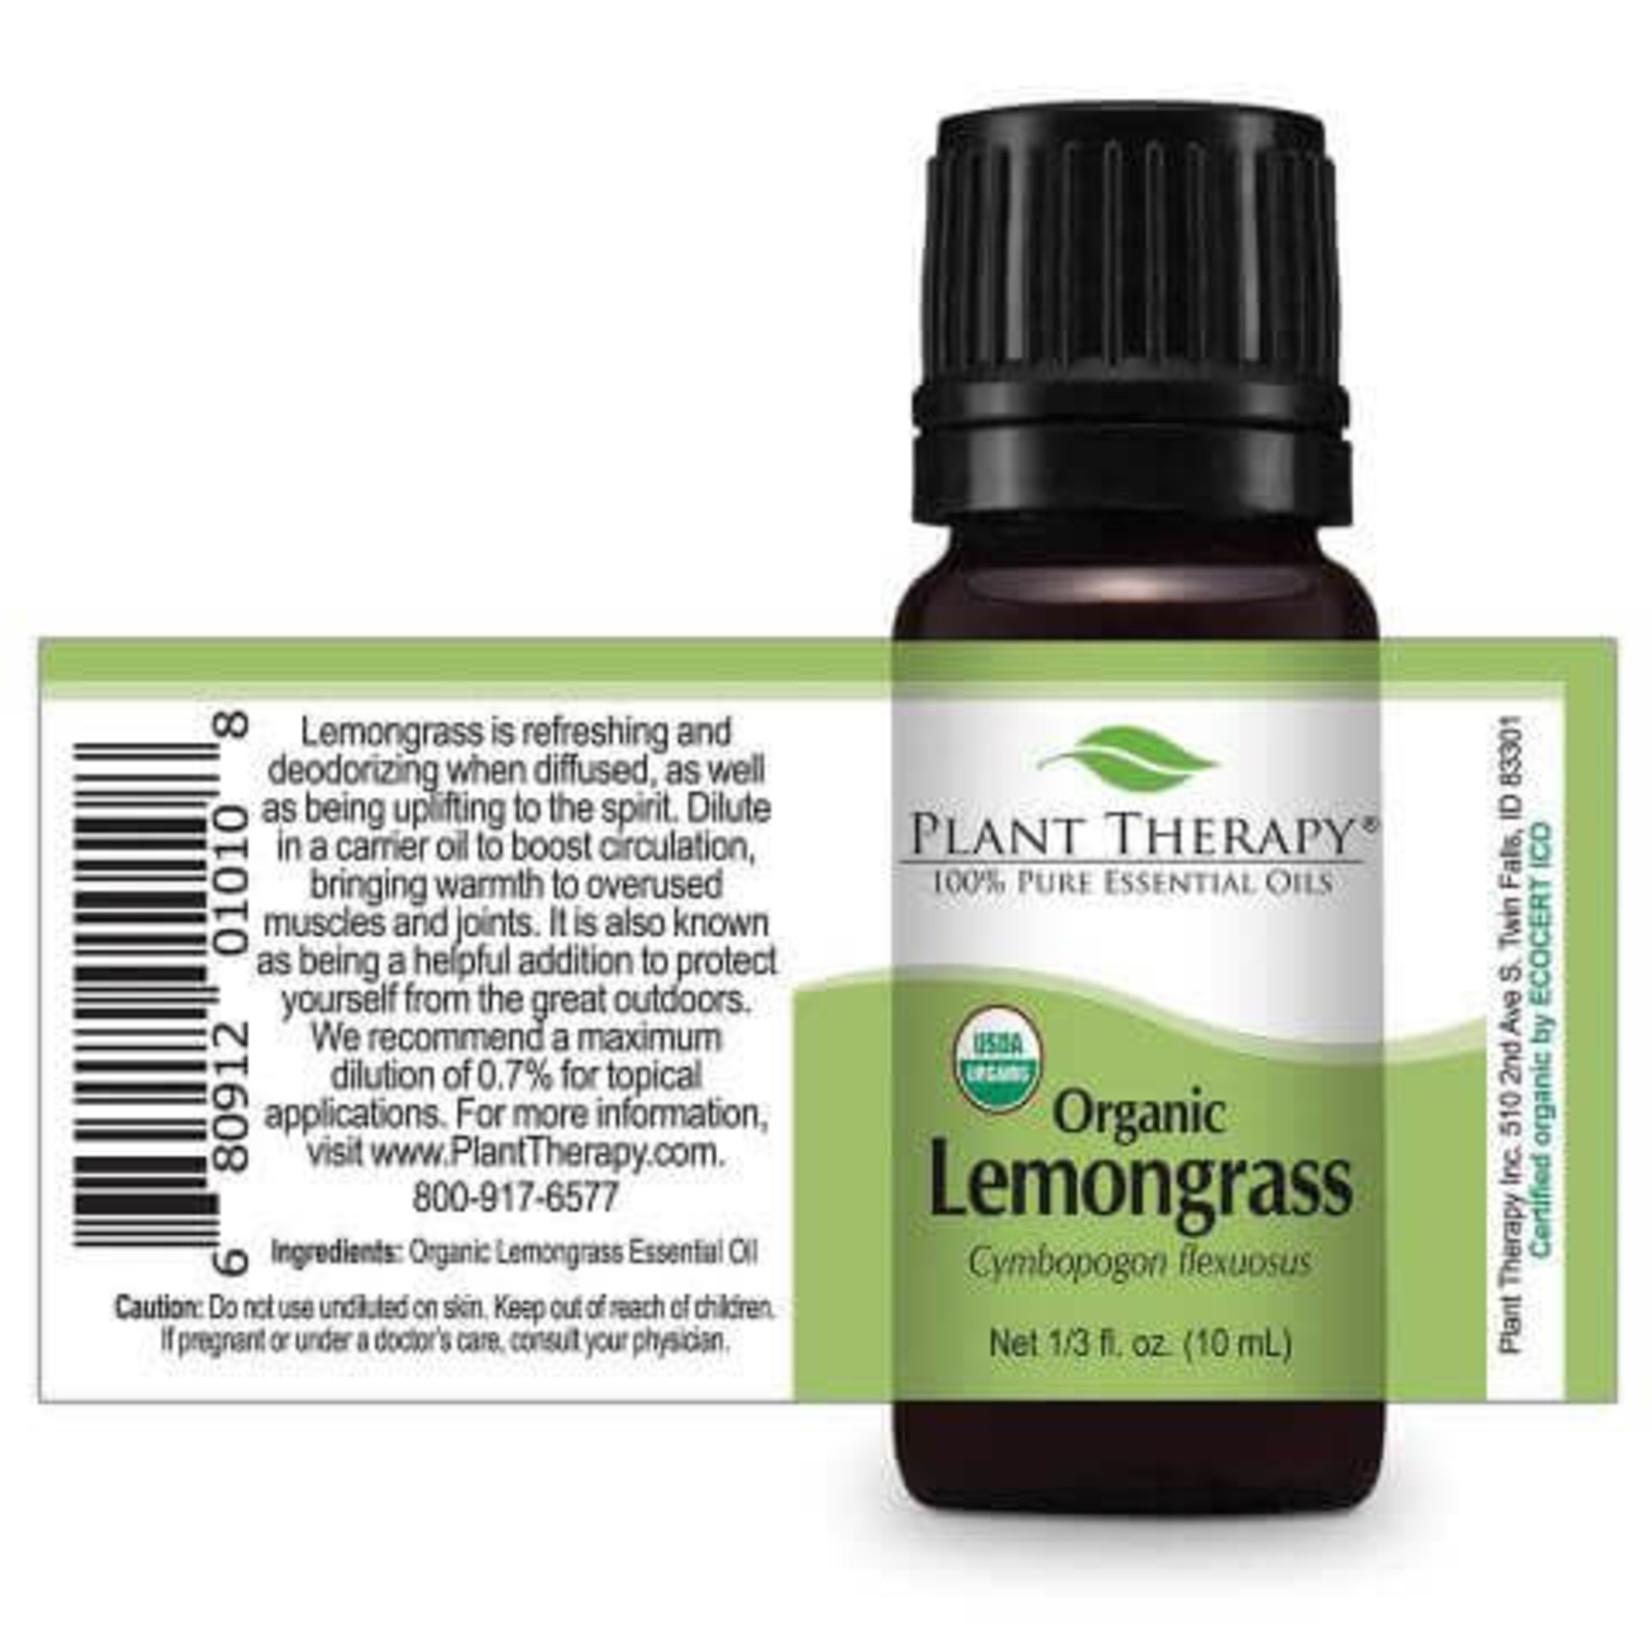 Plant Therapy PT Organic Lemongrass Essential Oil 10ml